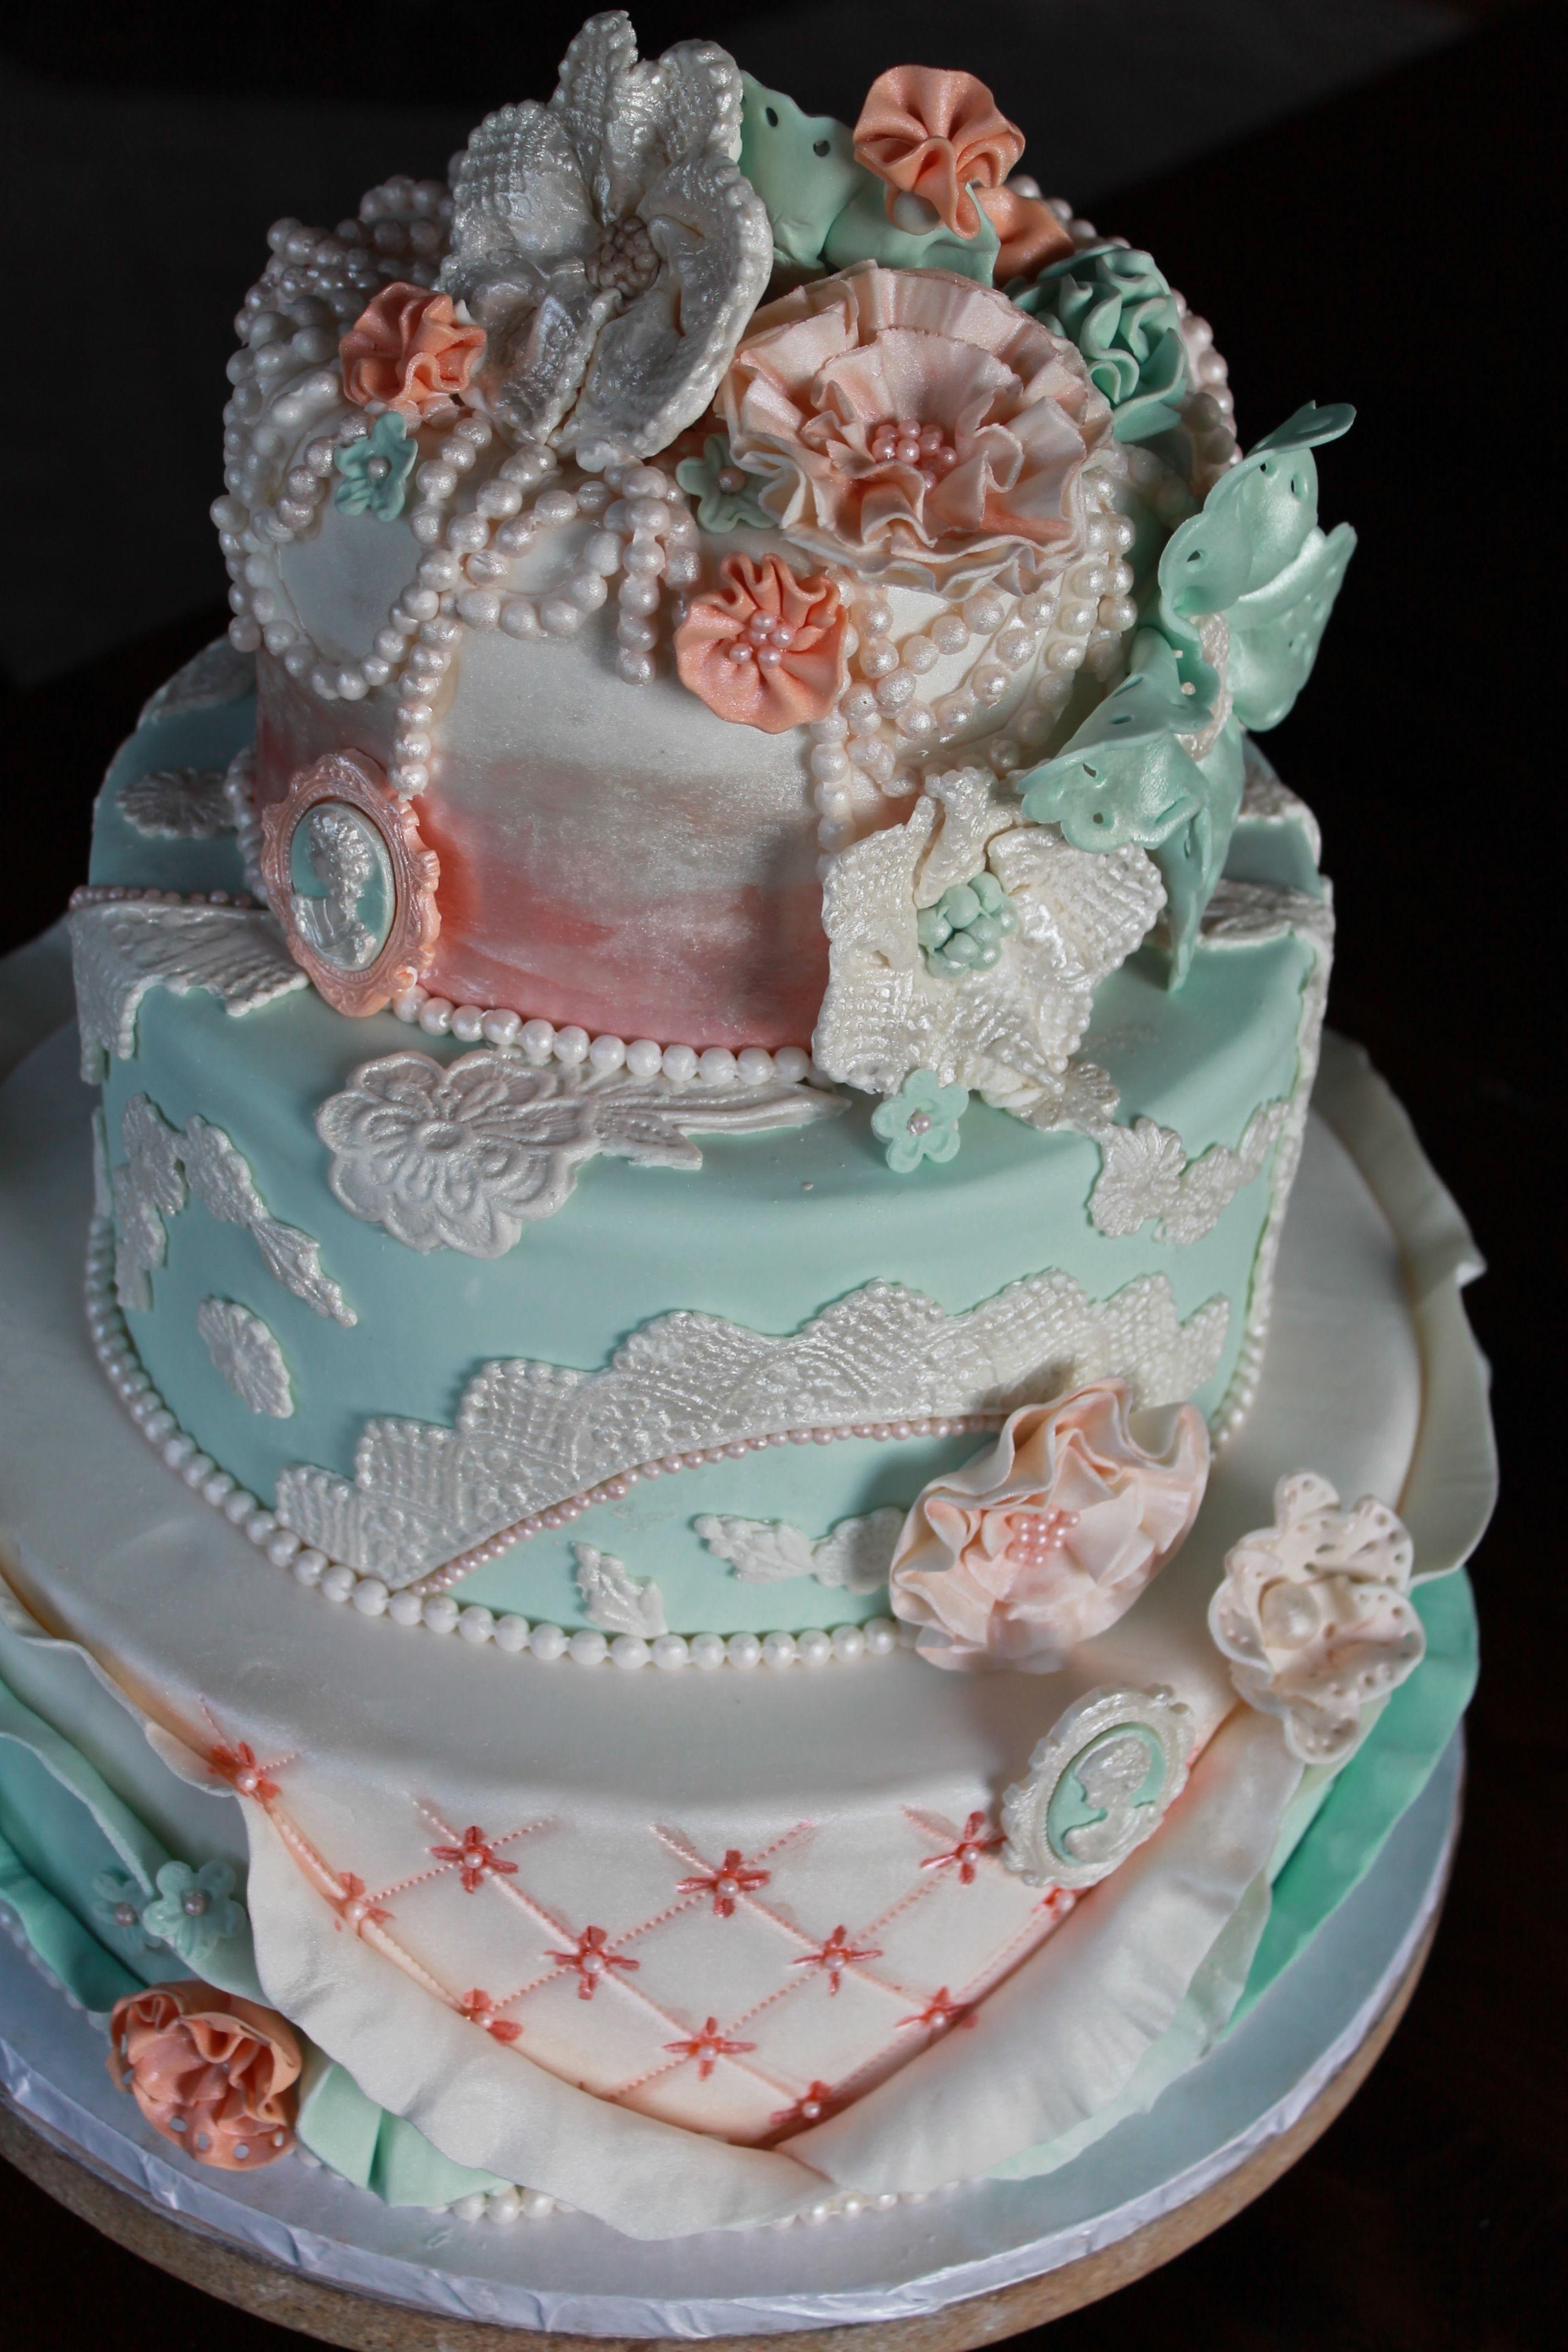 Shabby Chic Wedding Cake; Lace Cake; Ruffle Cake; Vintage Cake; Gumpaste  Fabric Flowers; Gumpaste Camio; Pearl U0026 Flower Topper